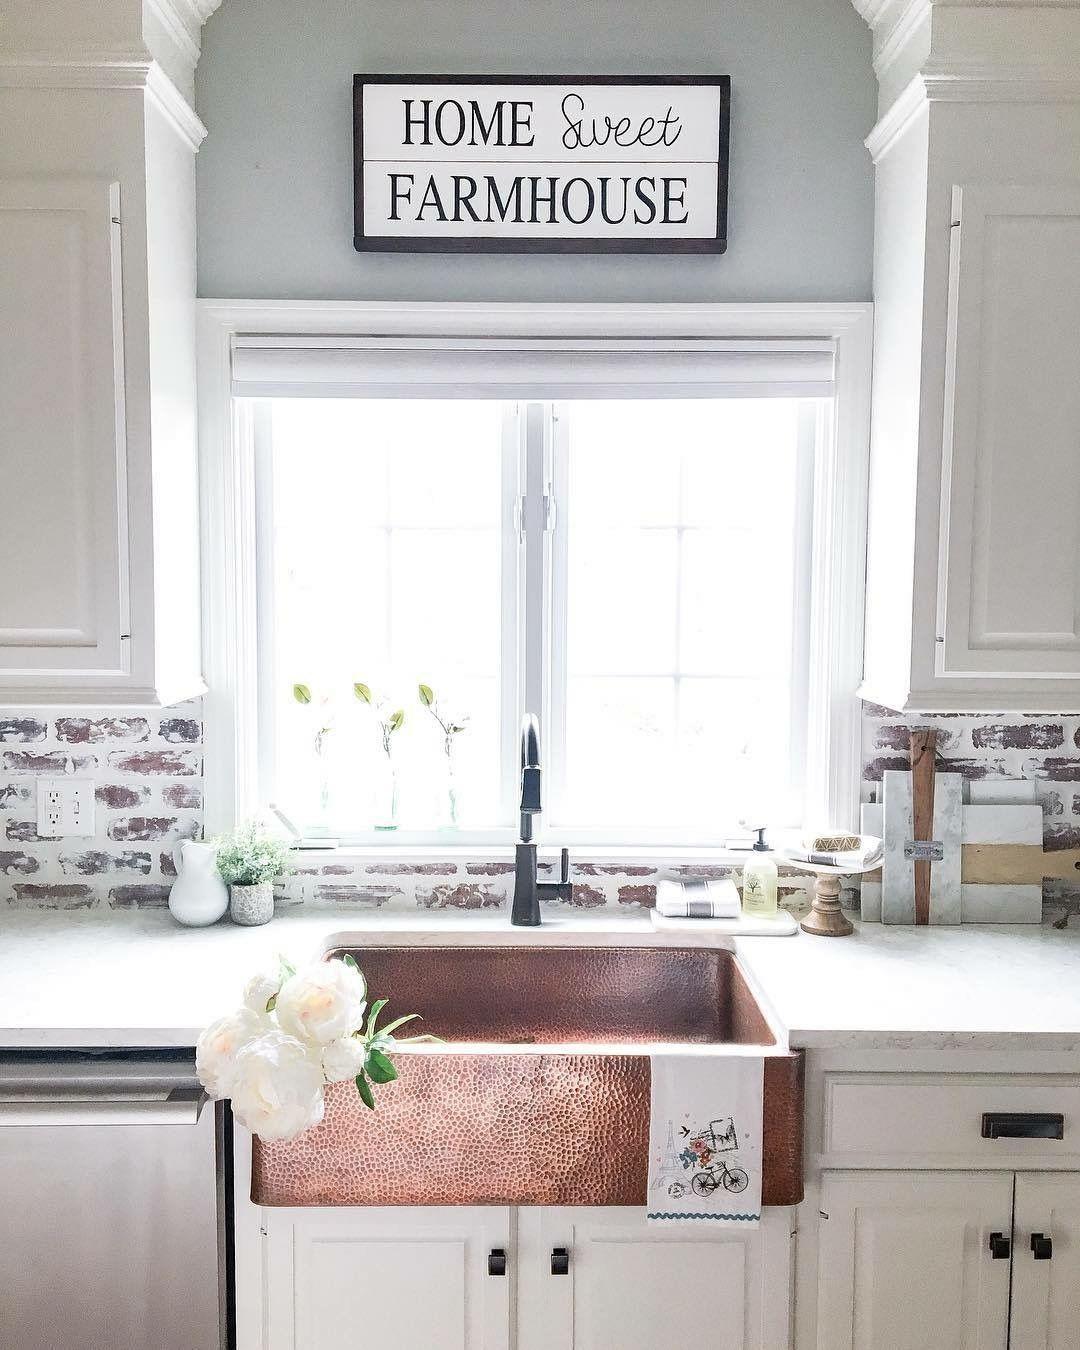 Love this sink and the white washed brick backsplash arletts